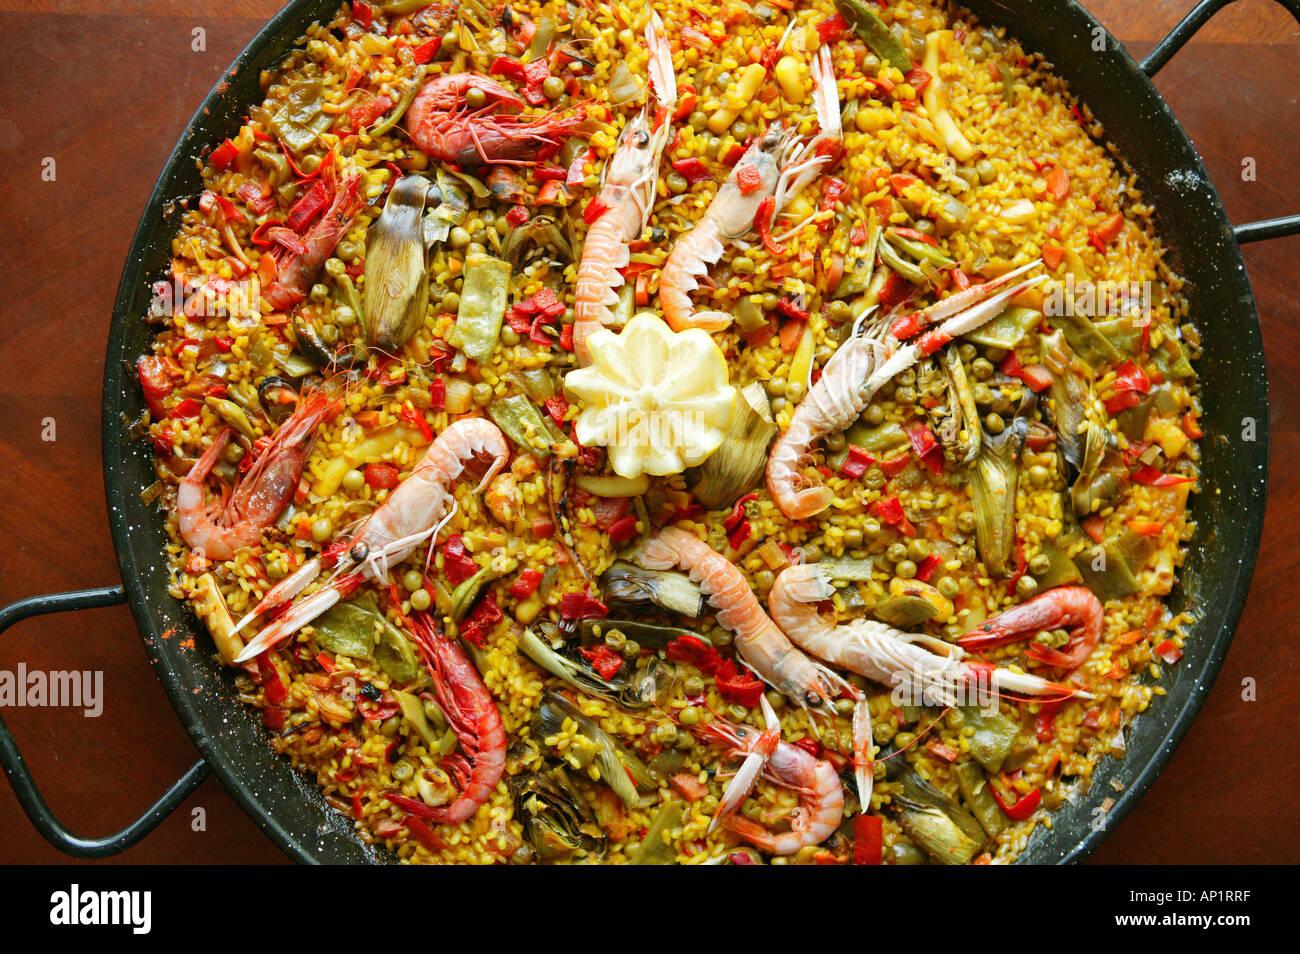 Paella Spain Food Typical Gastronomy Spanish Gastronomy Stock